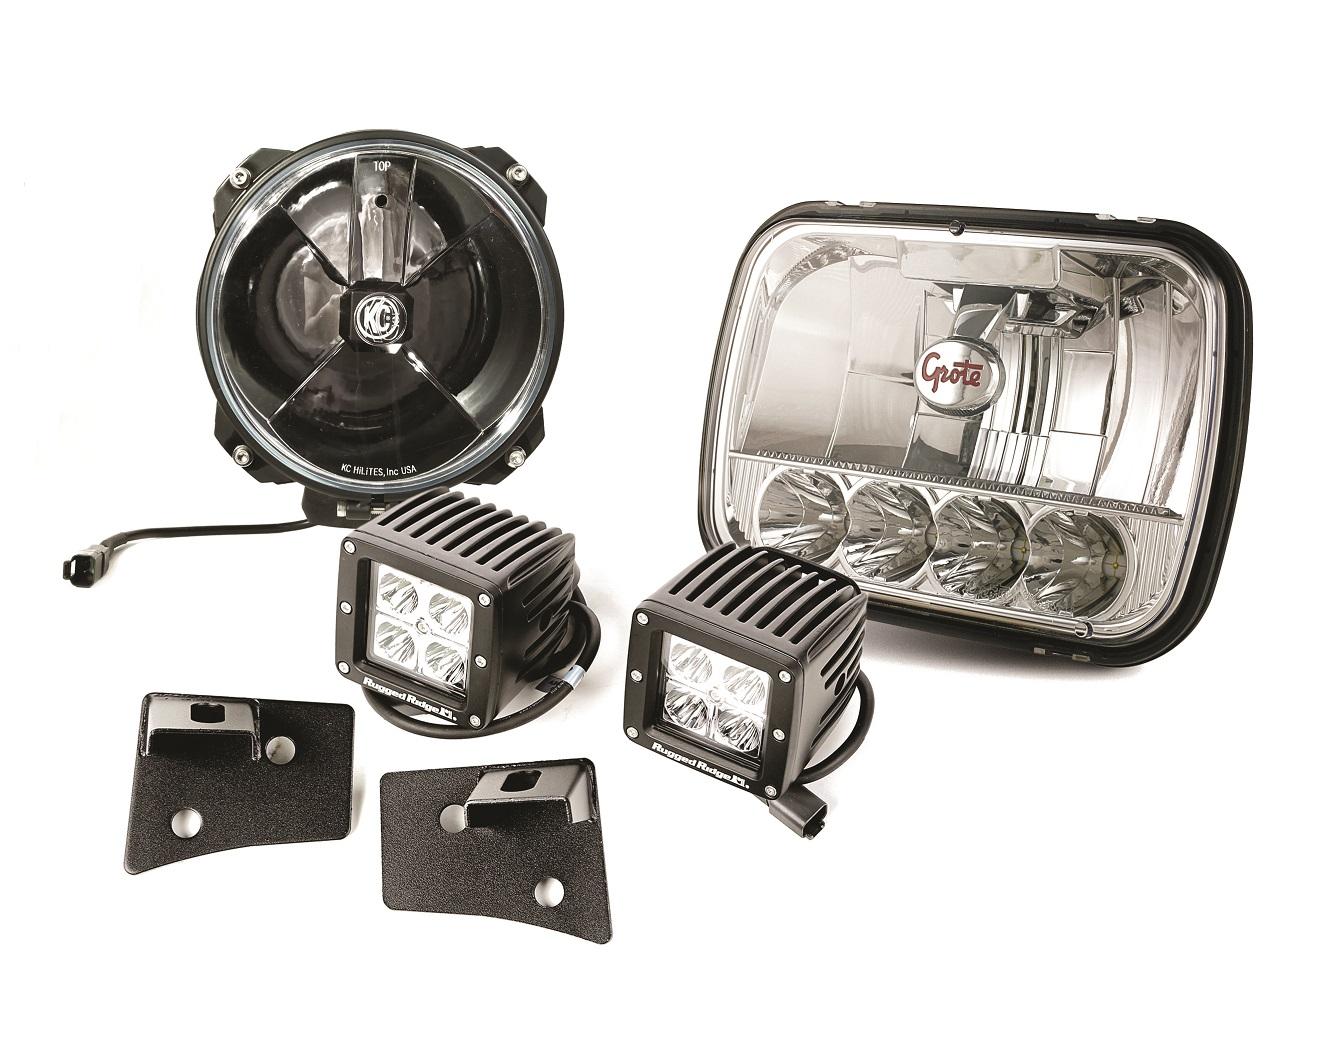 Relay Wiring Besides Kc Light Harness As Well Gravity Led Lights Wrangler Life After Dark Tread Magazine